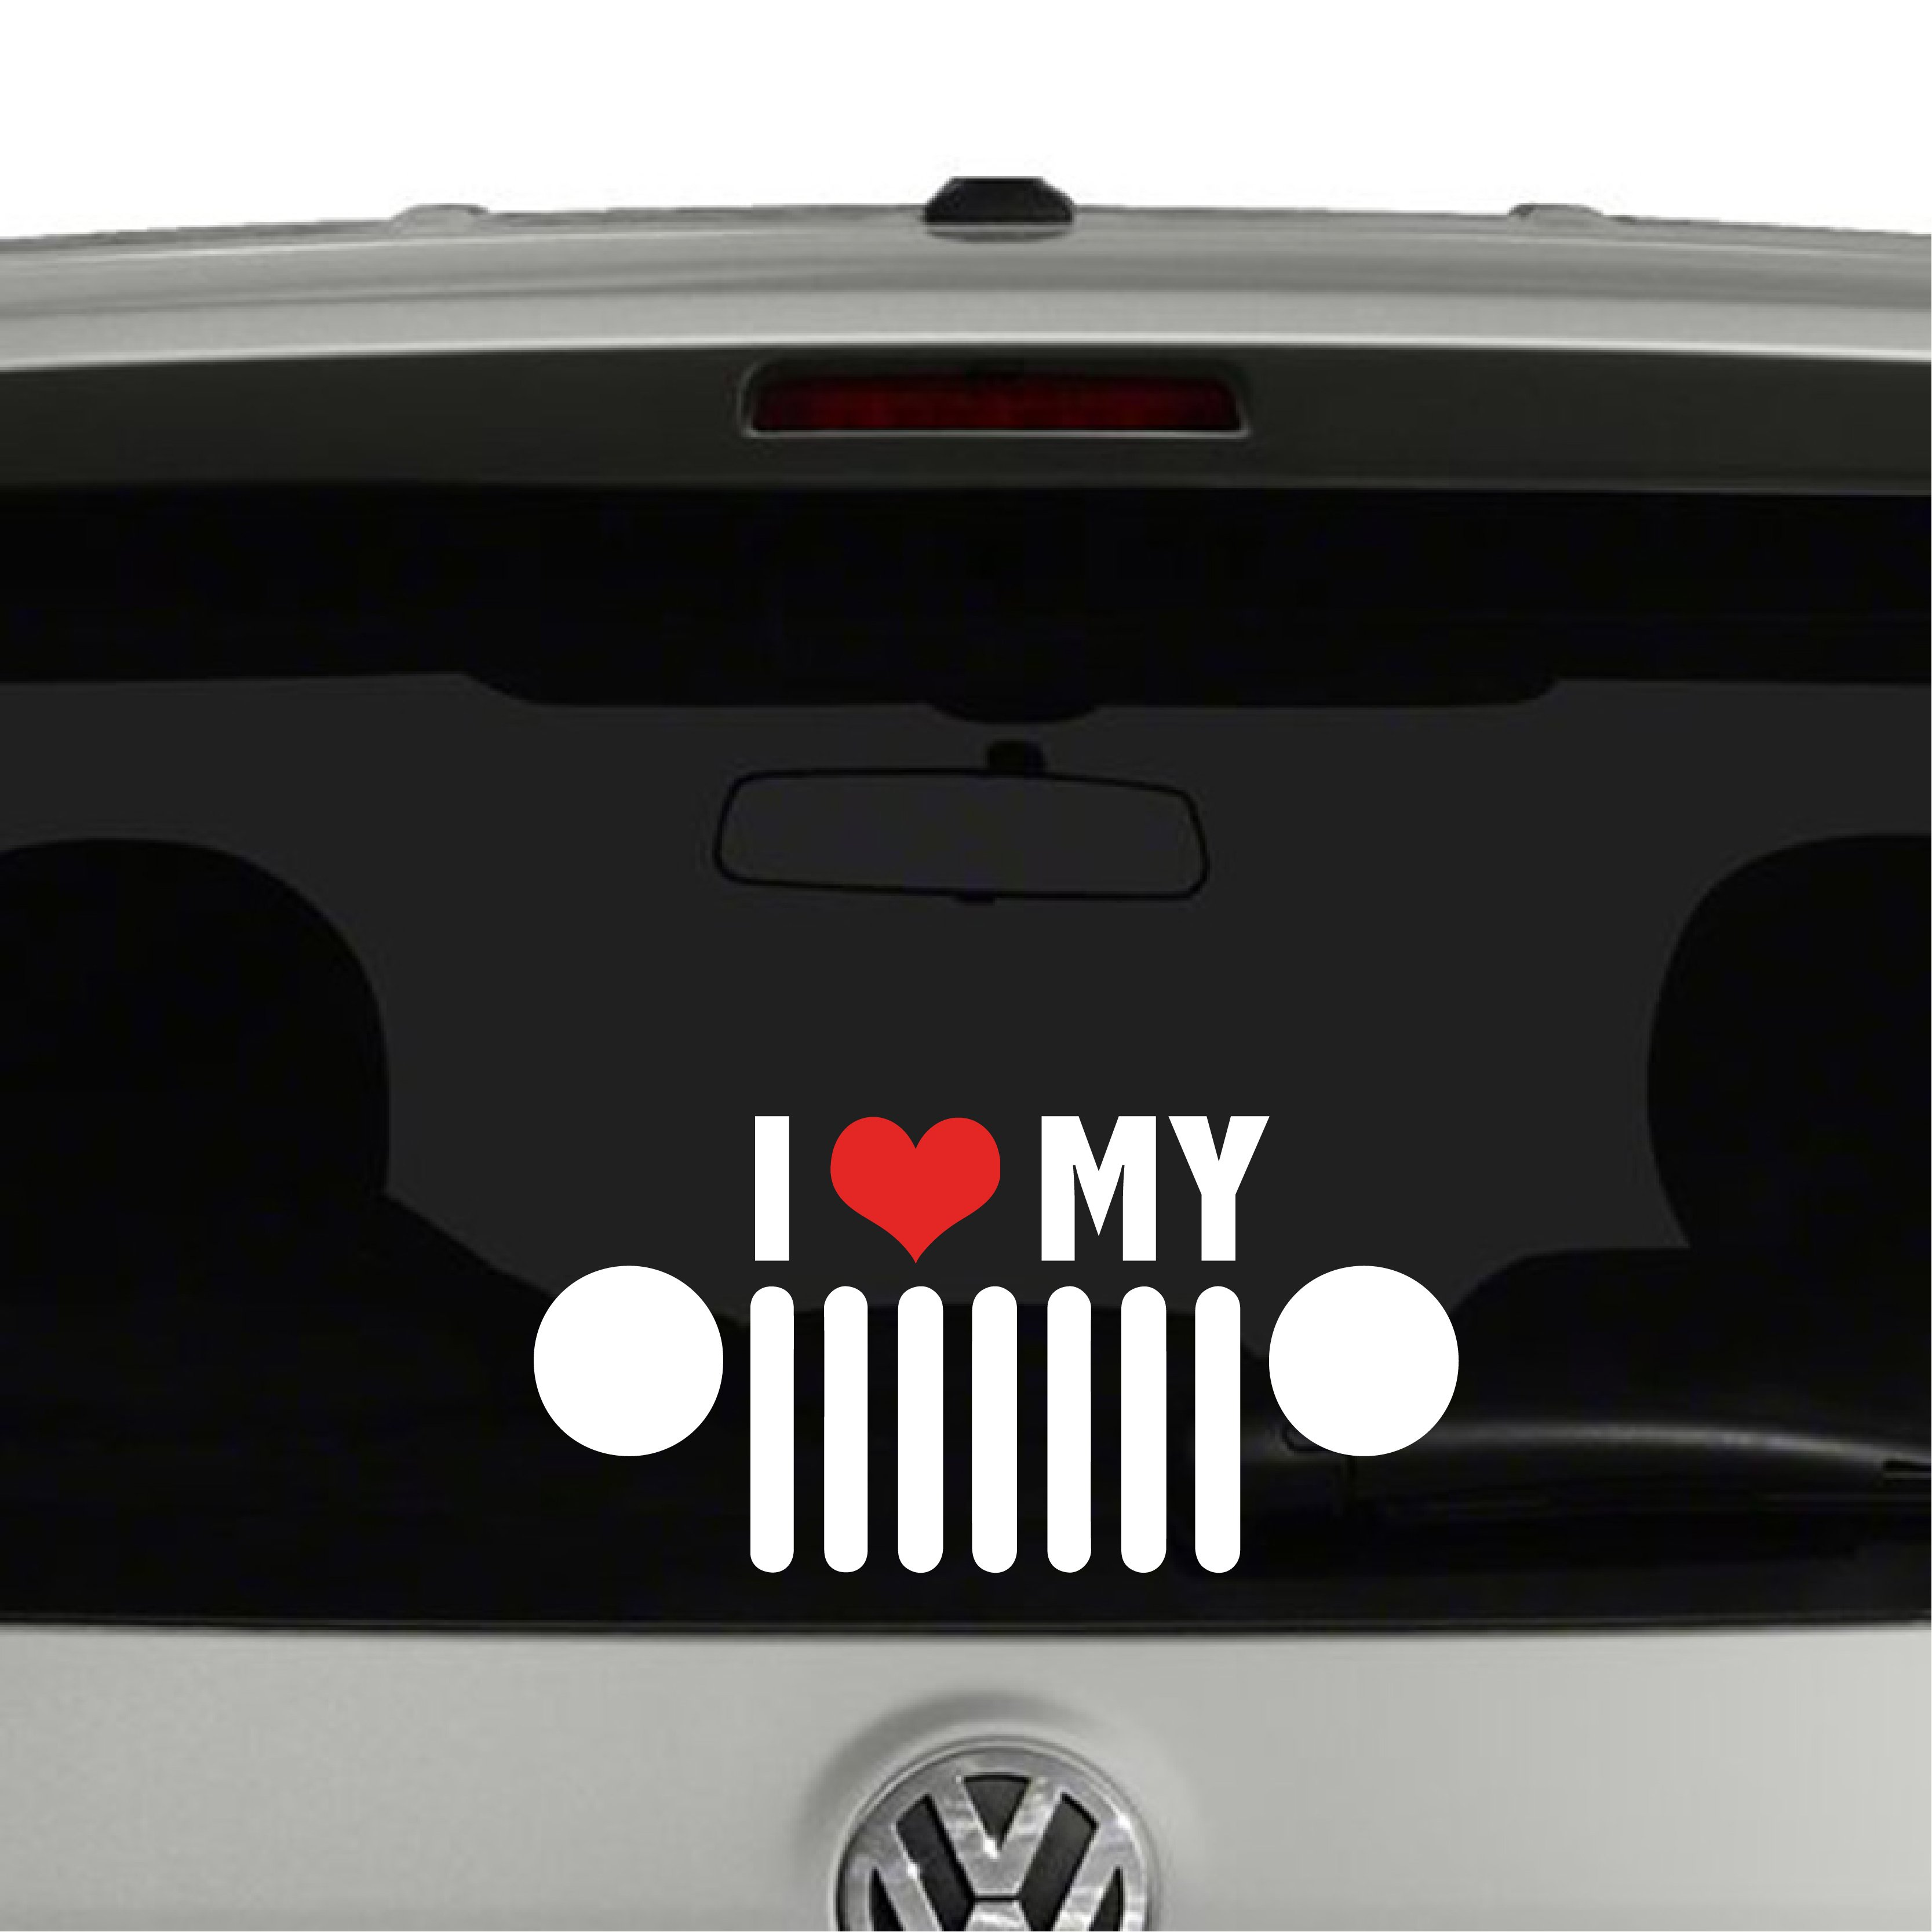 I Love My Jeep Heart Jeep Grill Vinyl Decal Sticker